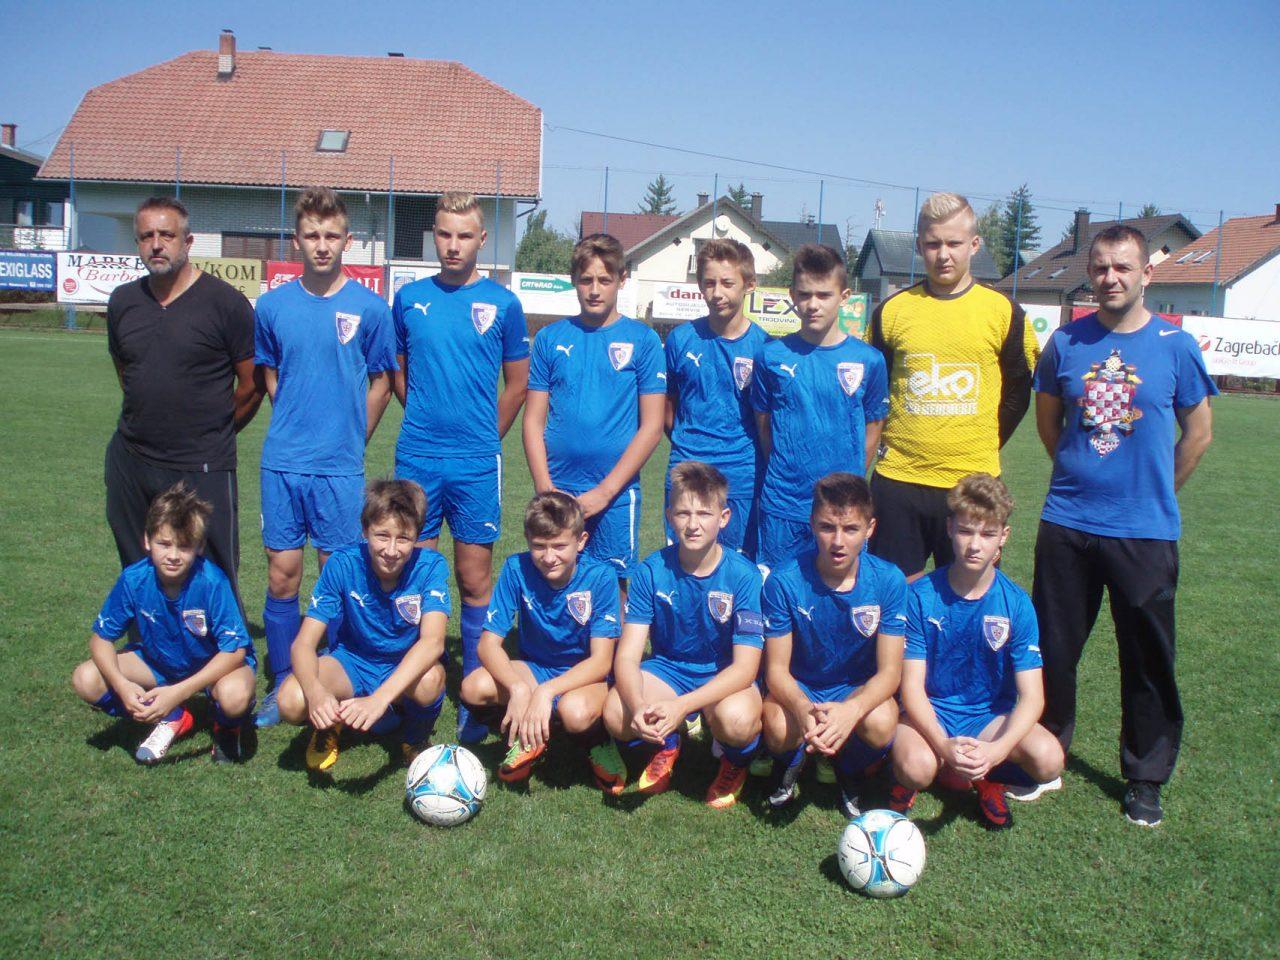 NK-Ivančica-Ivanec-pioniri-1280x960.jpg